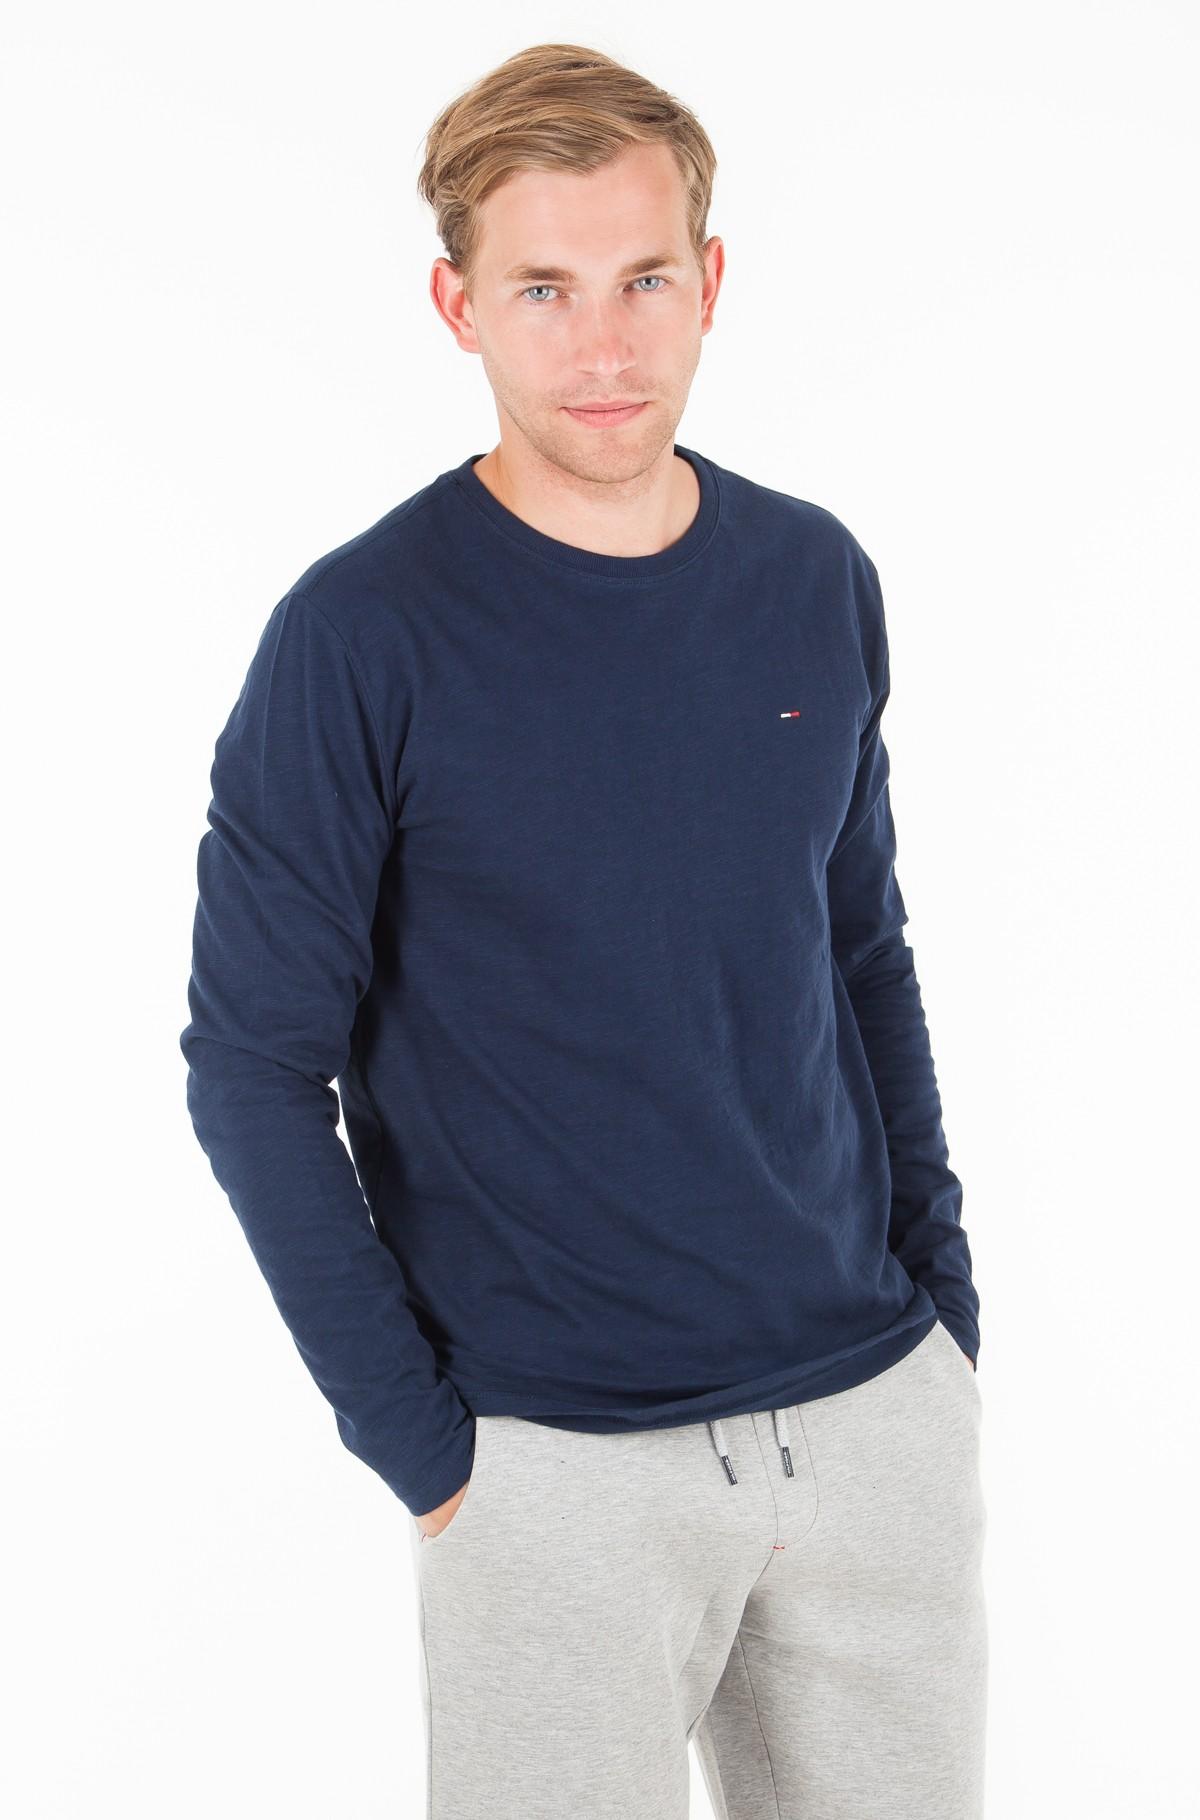 T-krekls ar garām piedurknēm  TJM SLUB LONG SLEEVE TEE-full-1